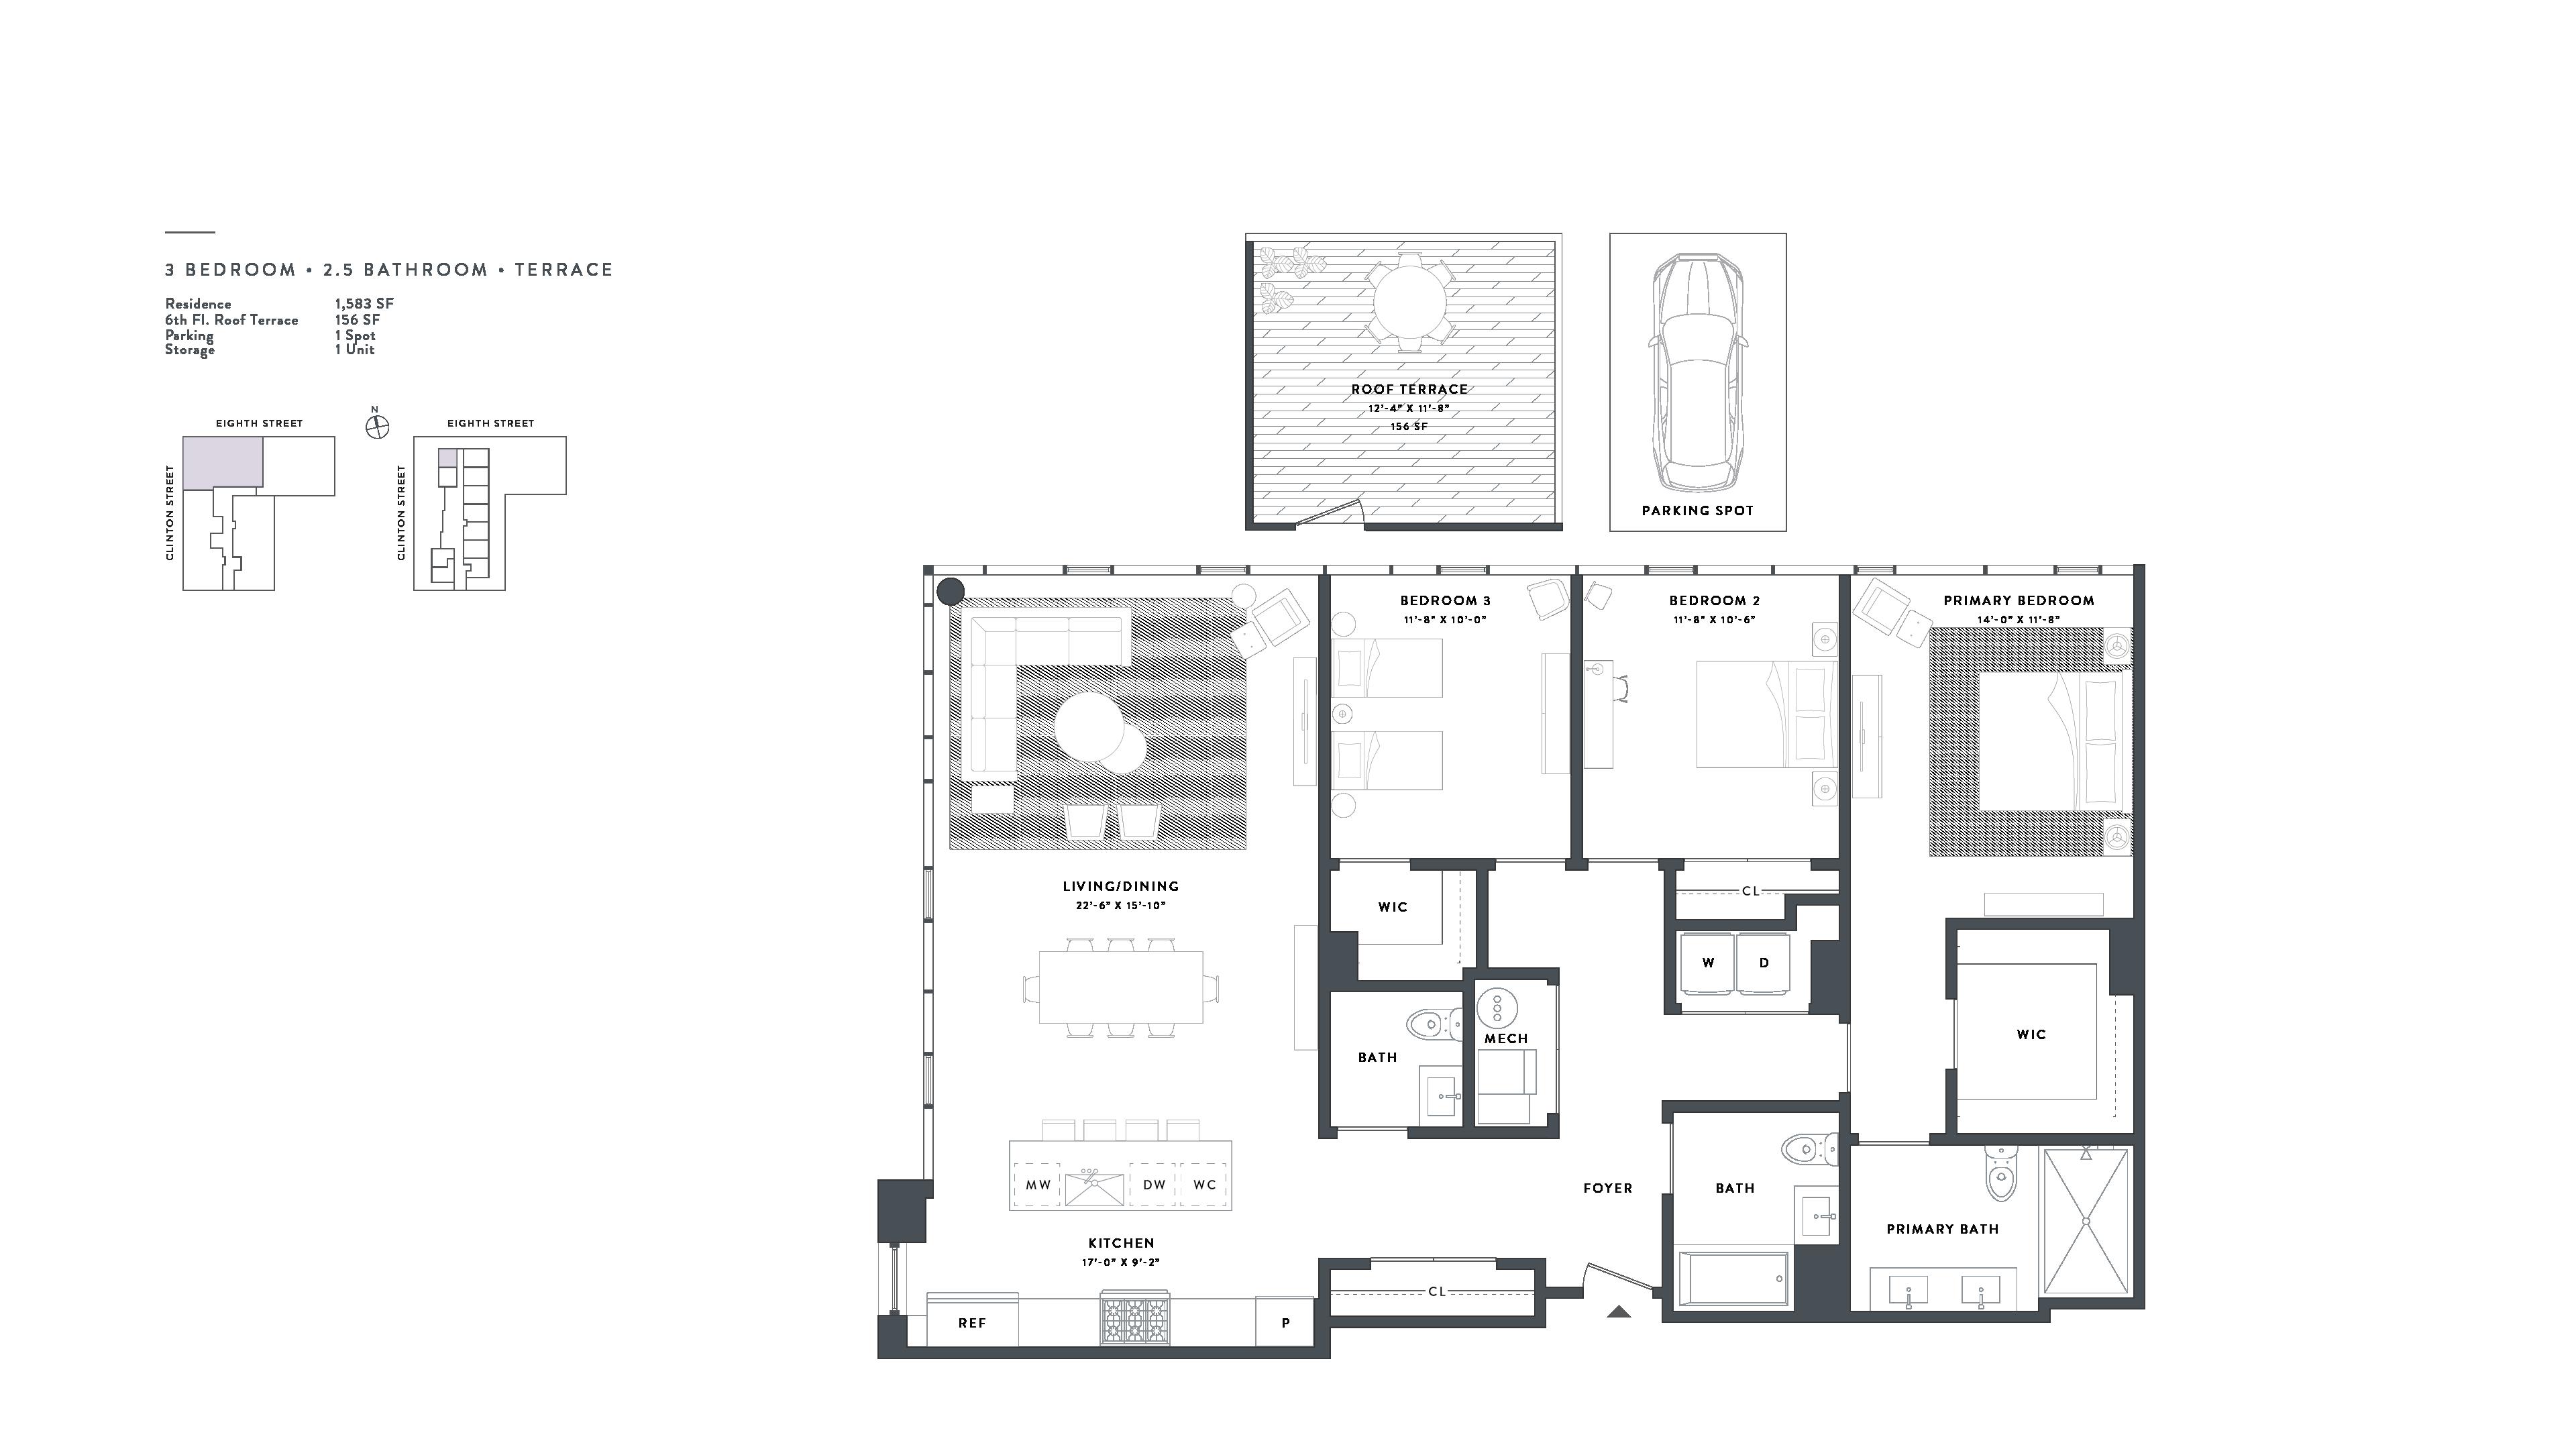 Appartment plan